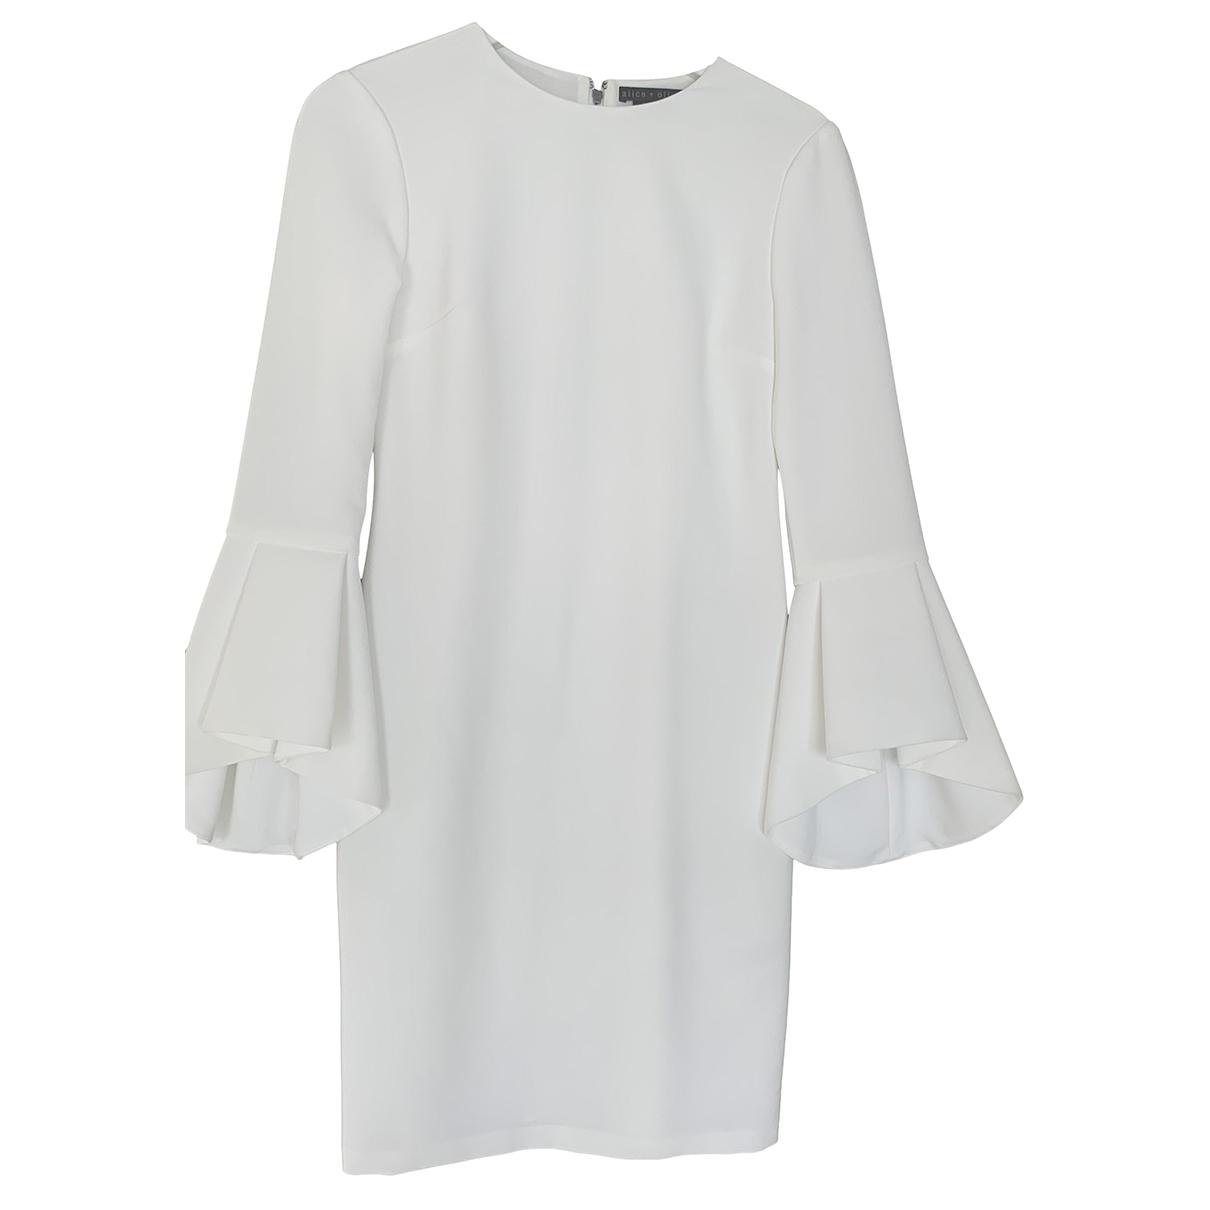 Alice & Olivia \N Kleid in  Weiss Polyester